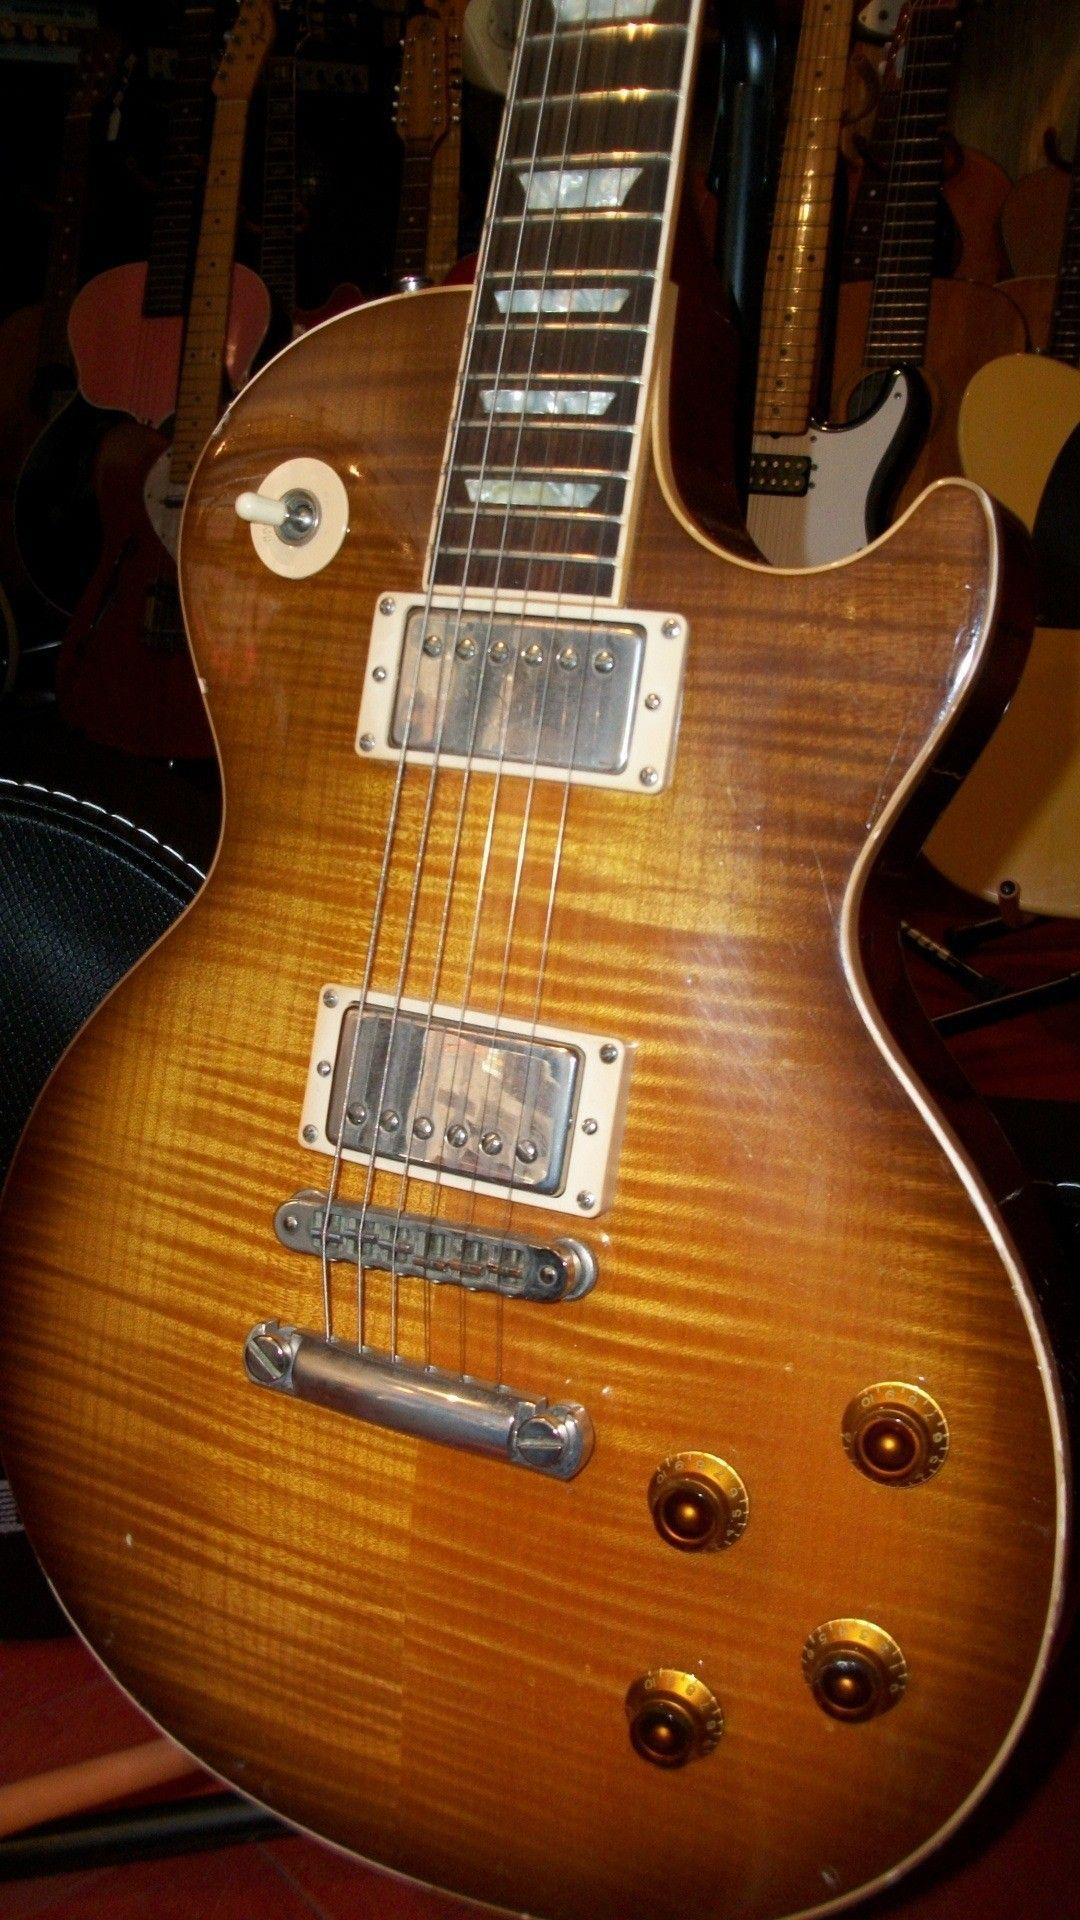 Guitar Smartphone Wallpapers Top Free Guitar Smartphone